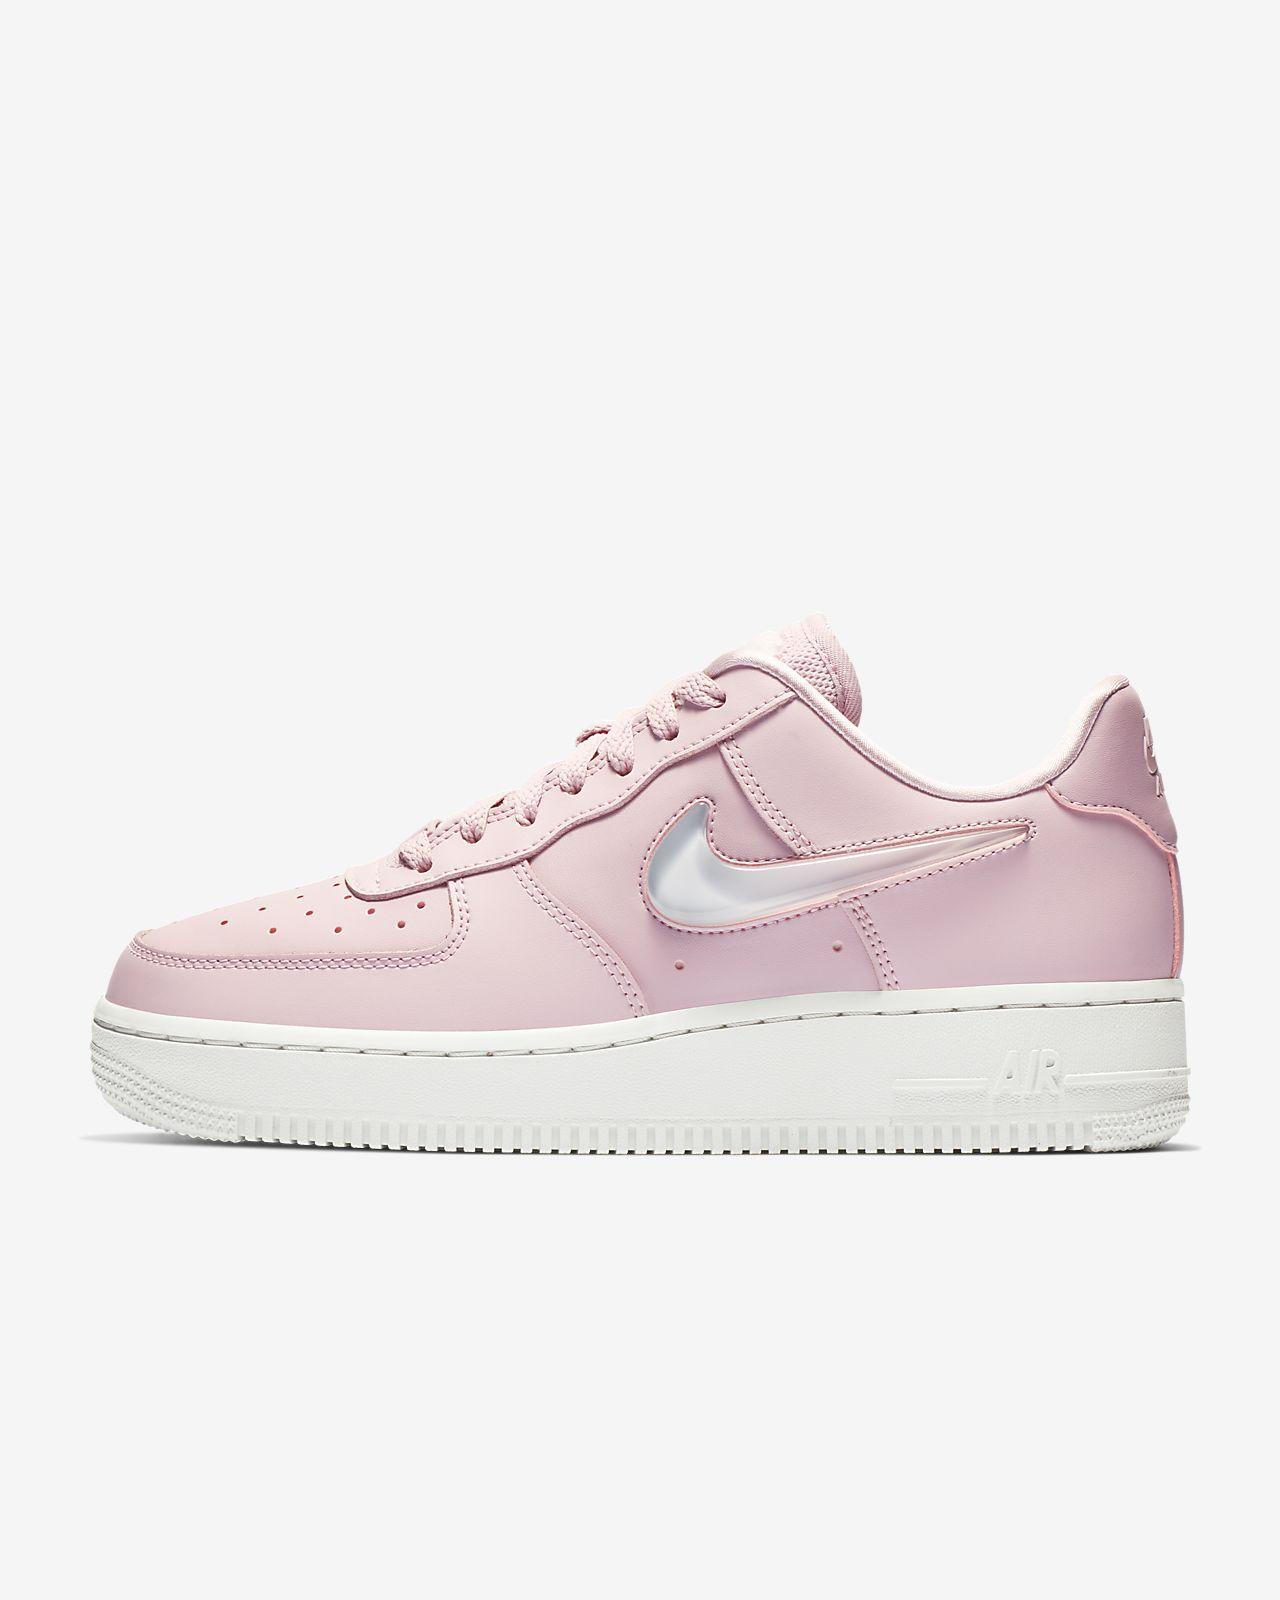 1c656f3522f Nike Air Force 1  07 SE Premium Women s Shoe. Nike.com DK